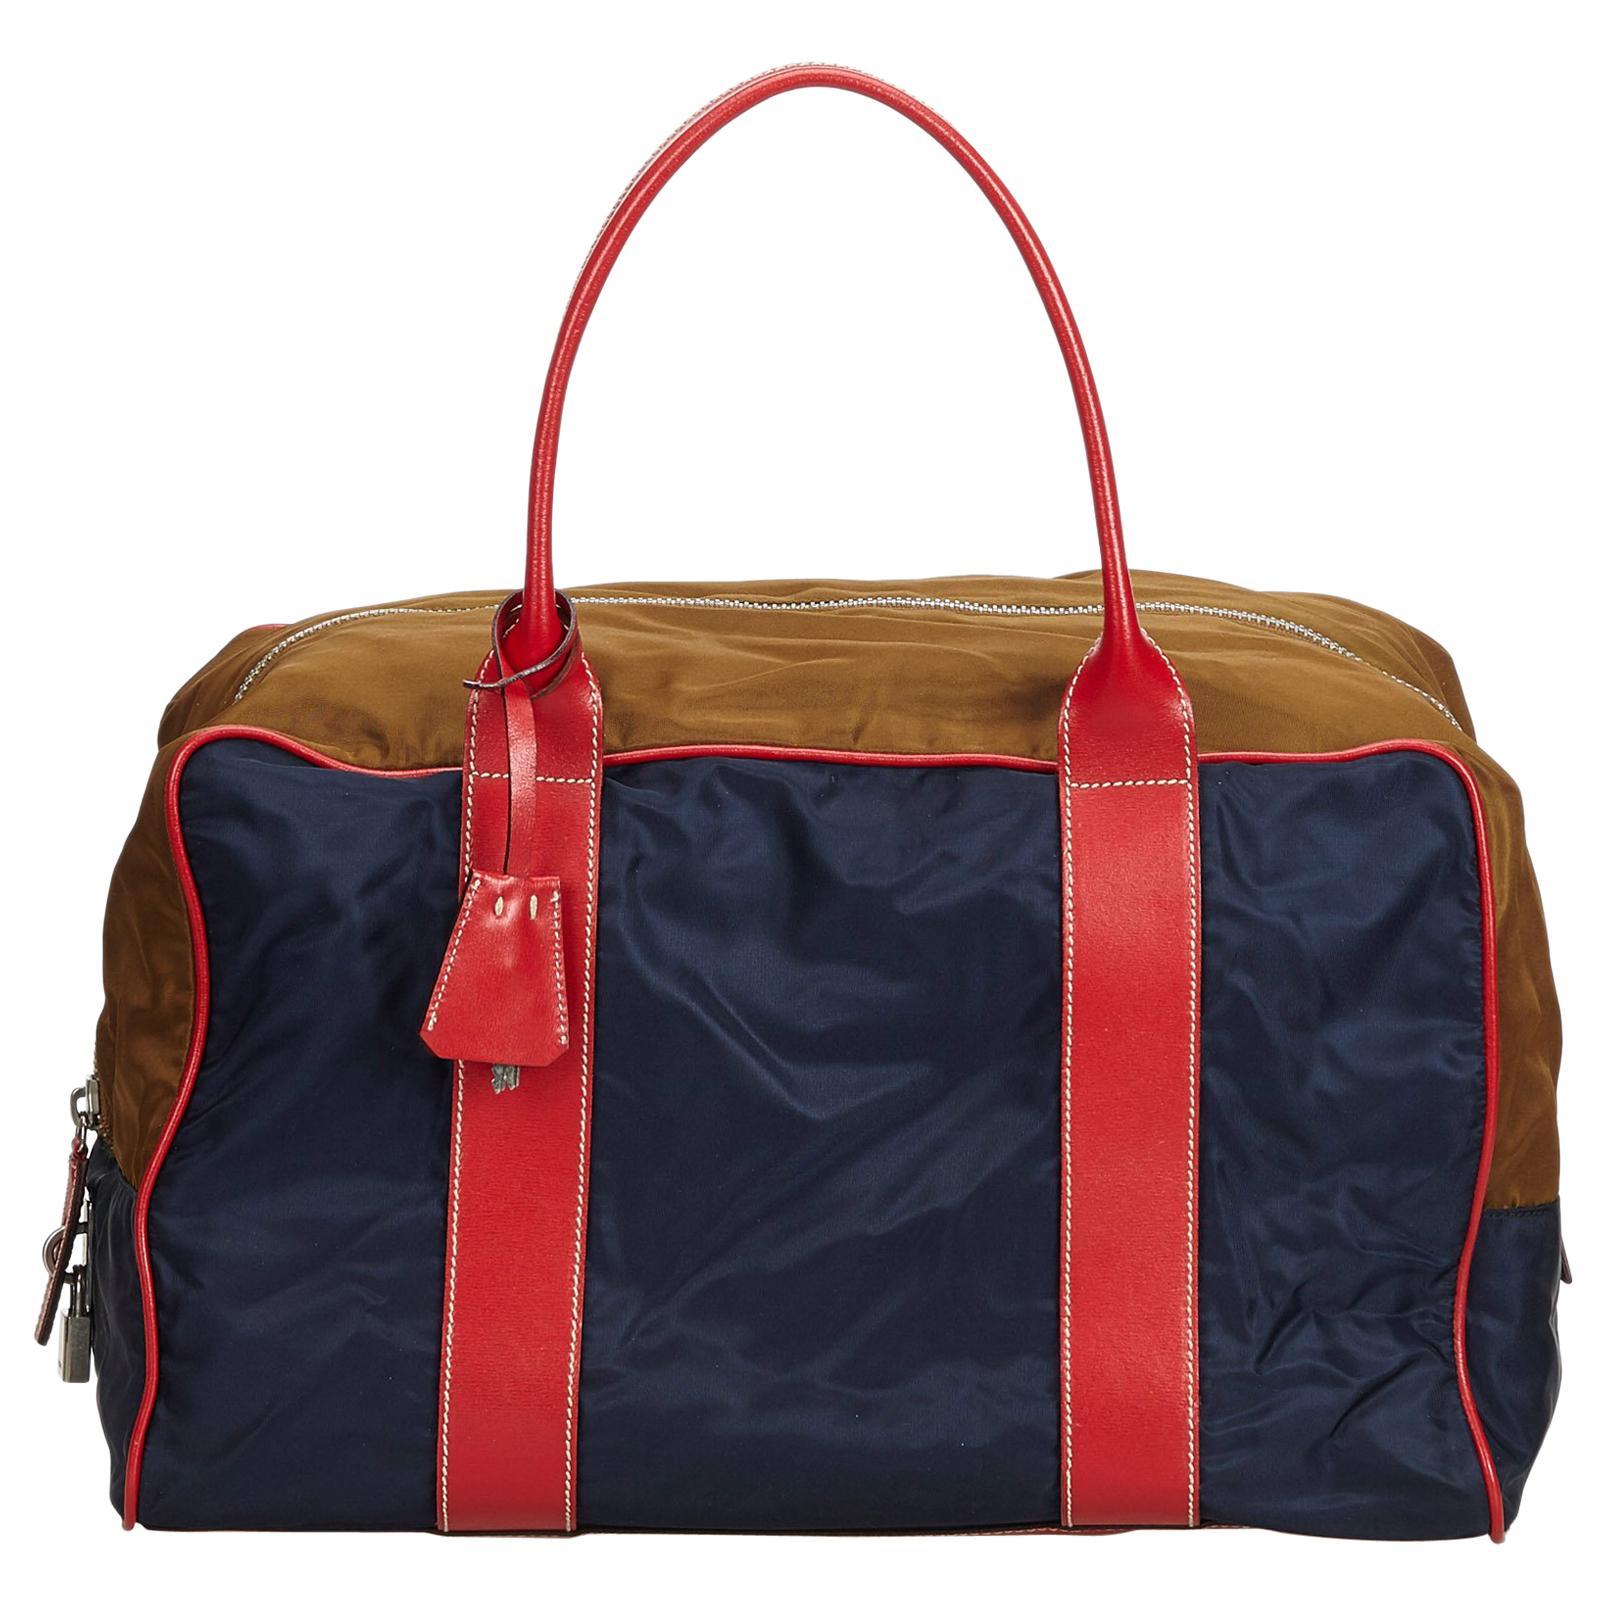 dada86fcad3f0d wholesale prada bn2316 handbags in khaki 818cd c0ba9